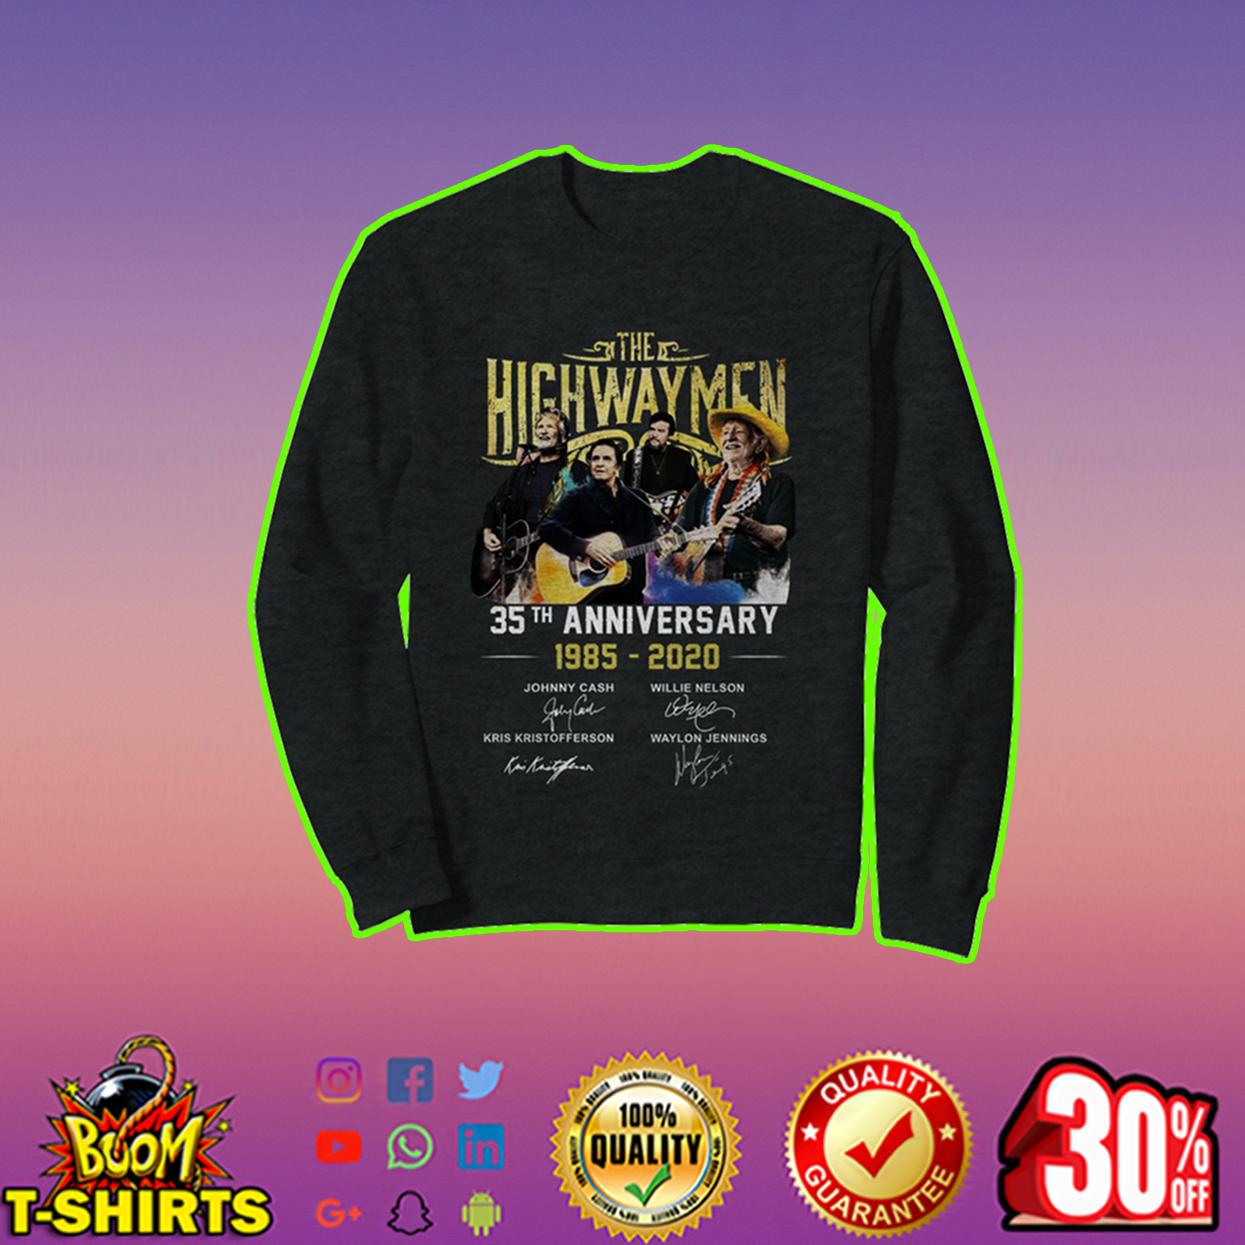 The Highwaymen 35th Anniversary sweatshirt